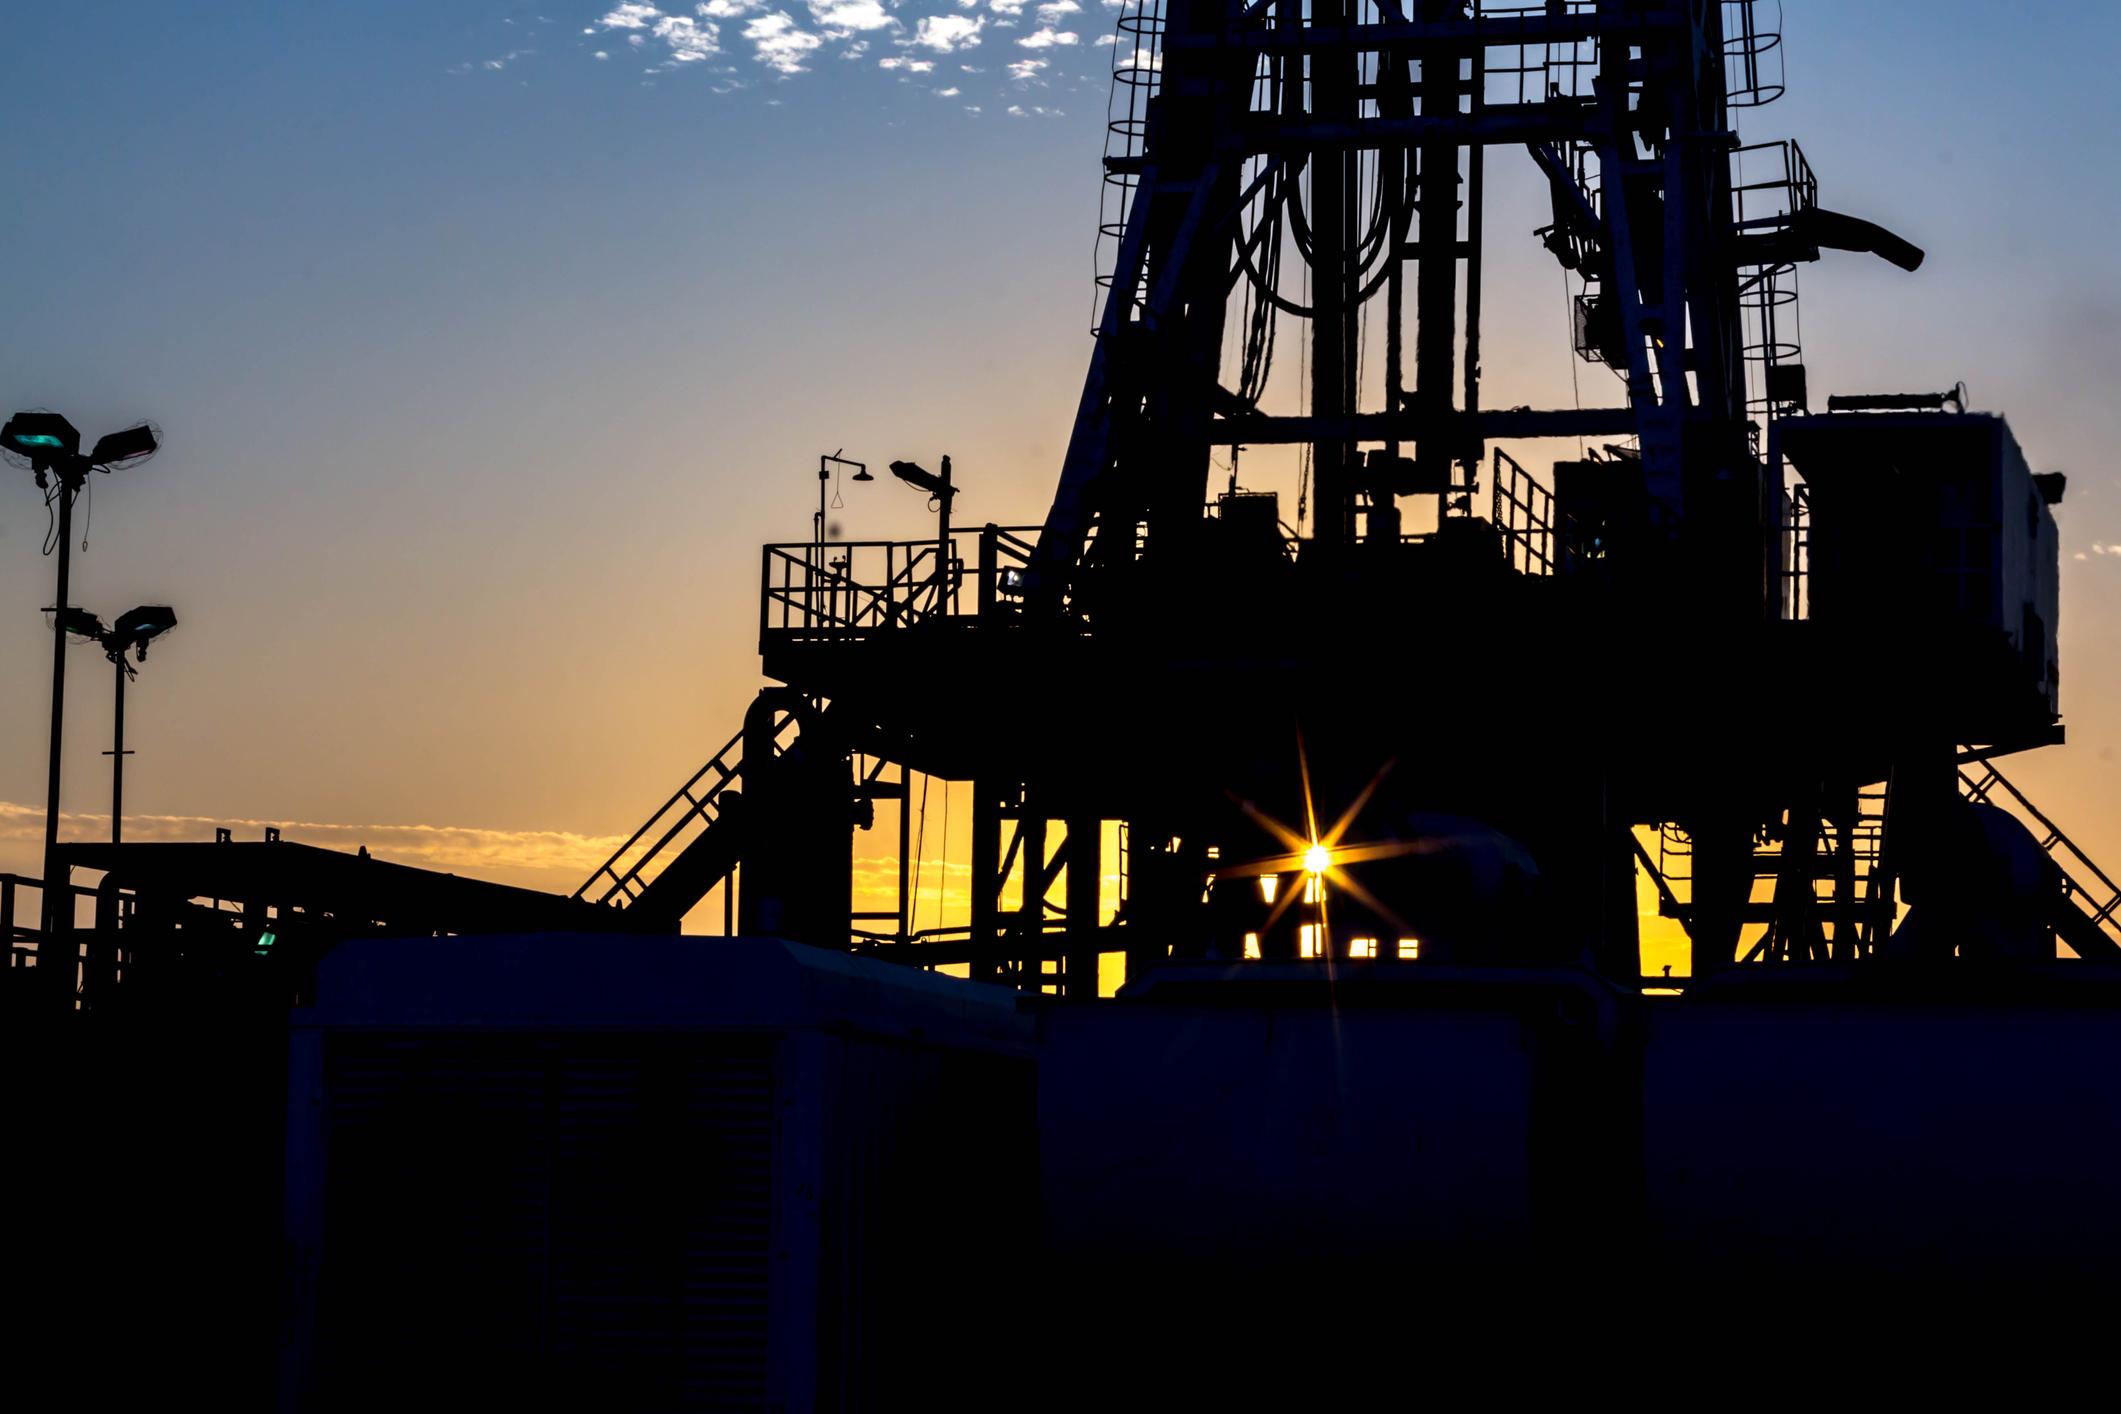 A drilling rig at dusk.